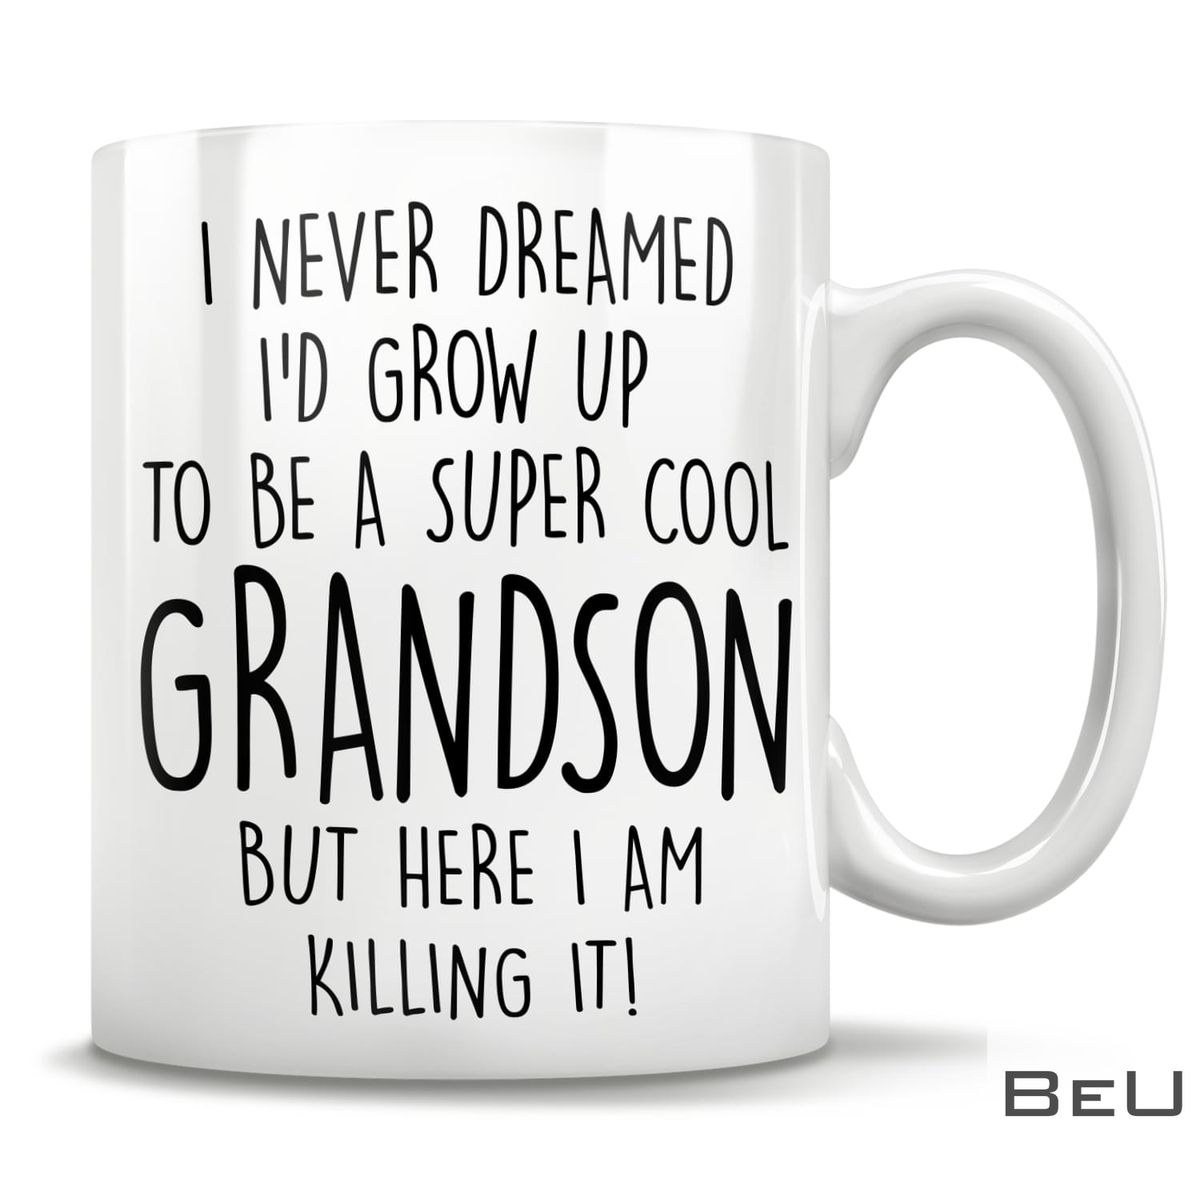 I never dreamed I'd grow up to be a super cool grandson but here i am killing it mug